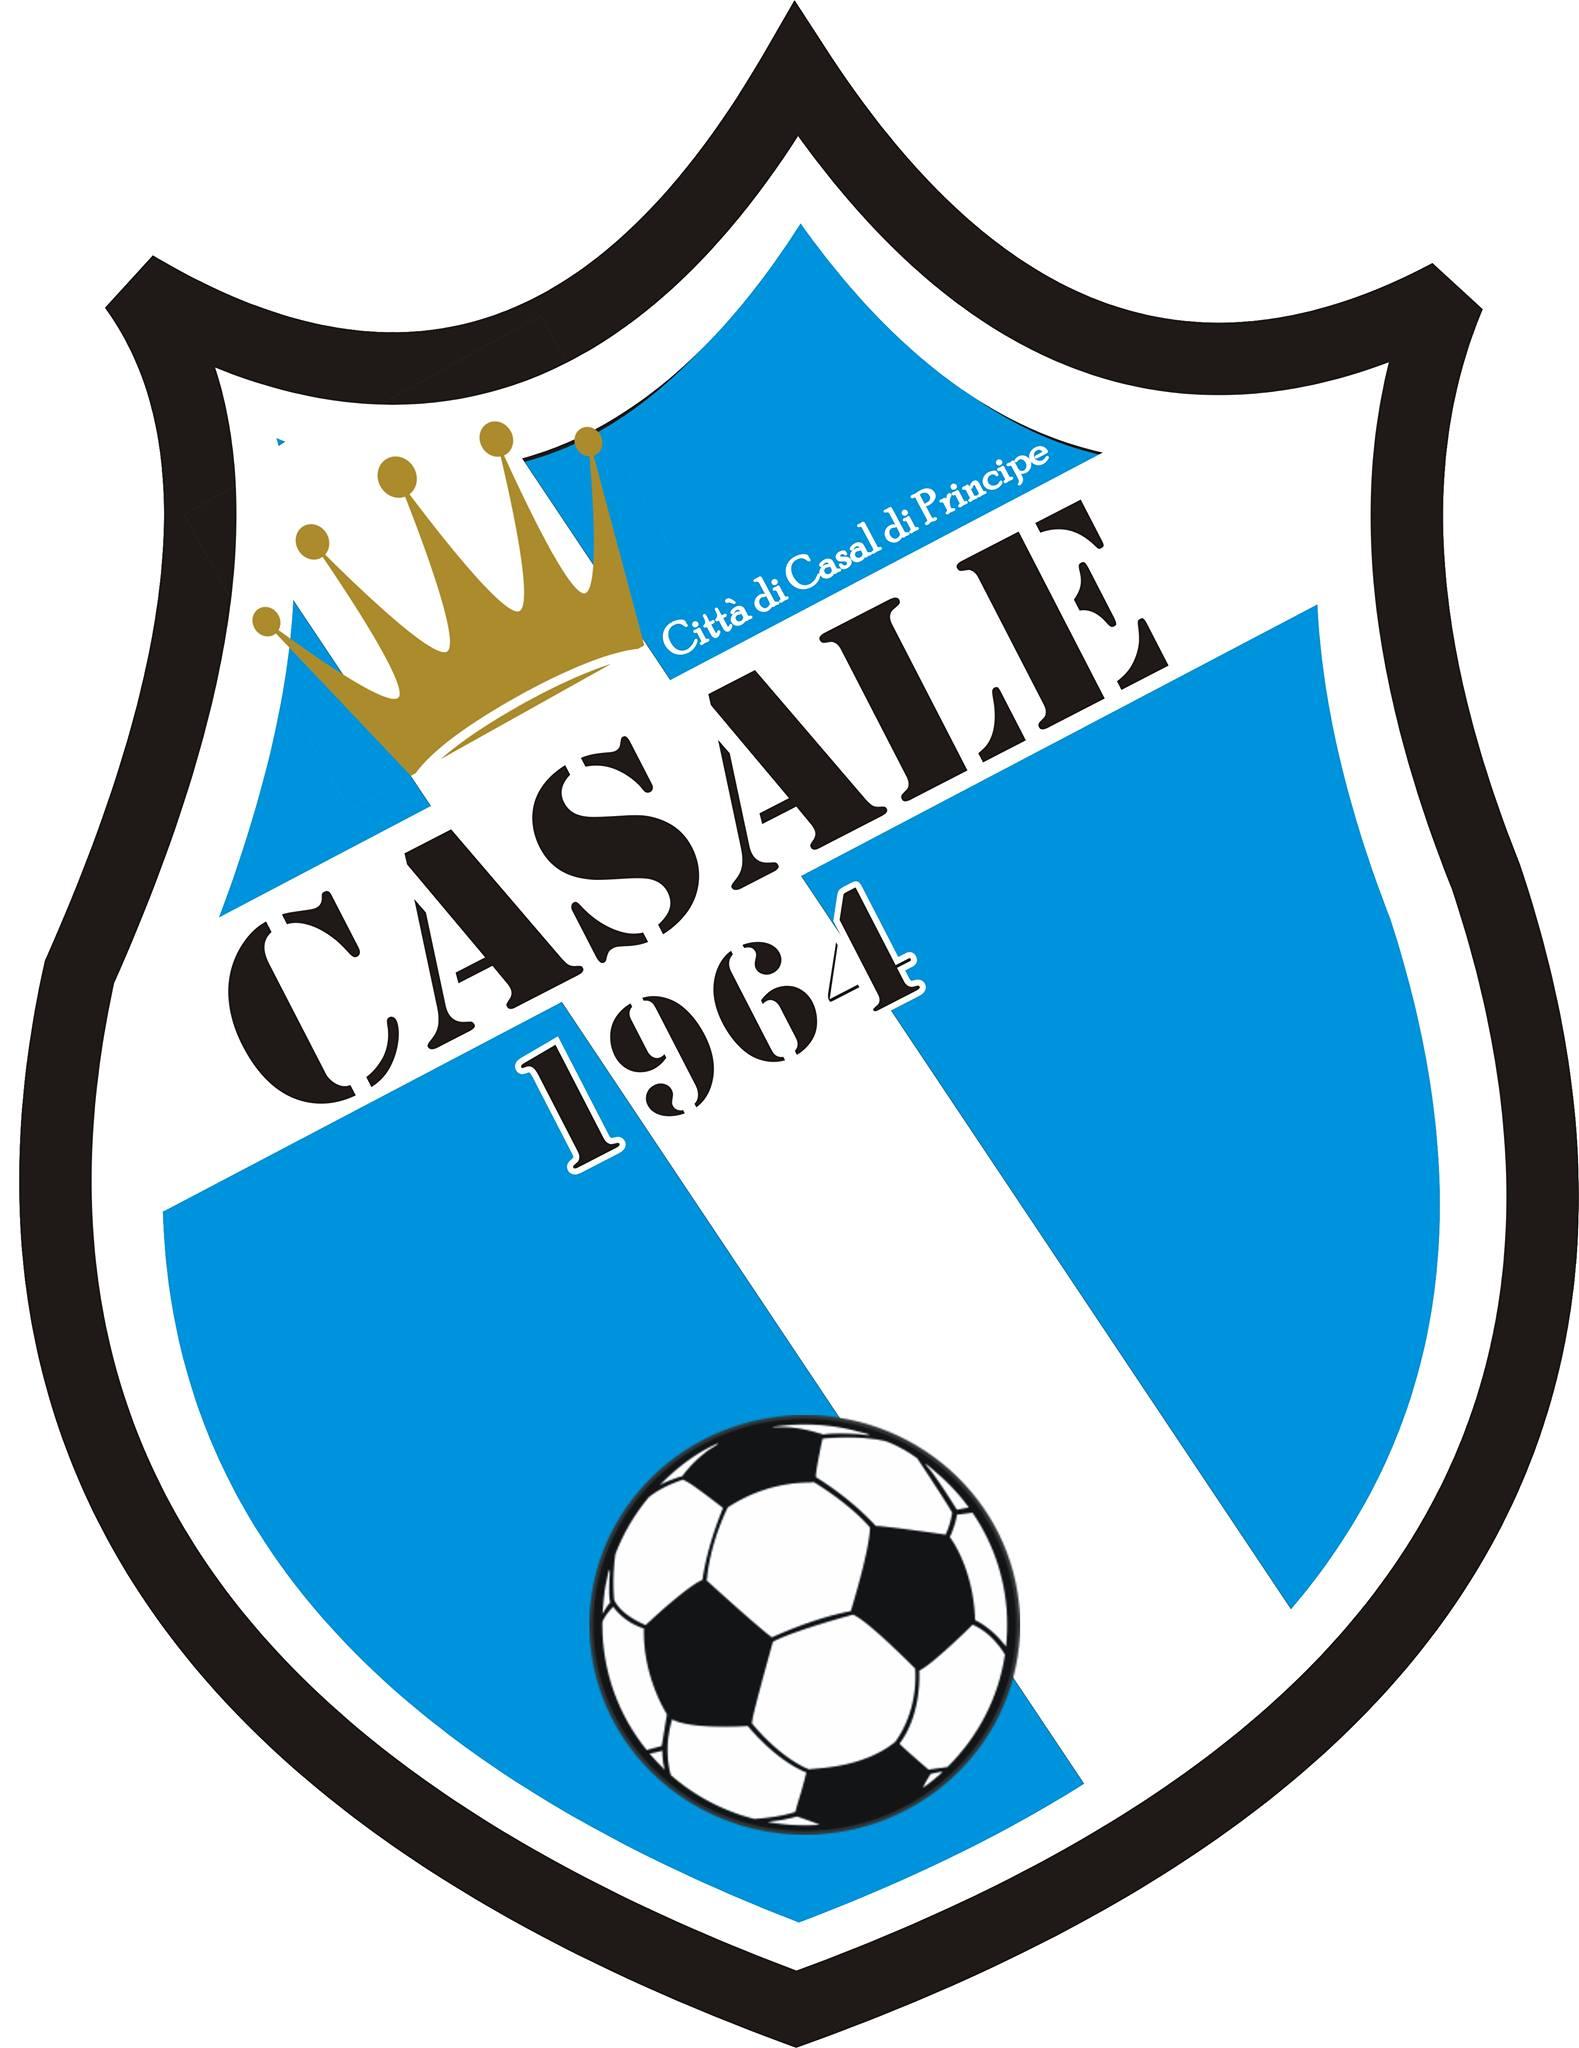 Seconda Categoria Girone A: Casale 1964 all'assalto della Real Virtus Baia 1947